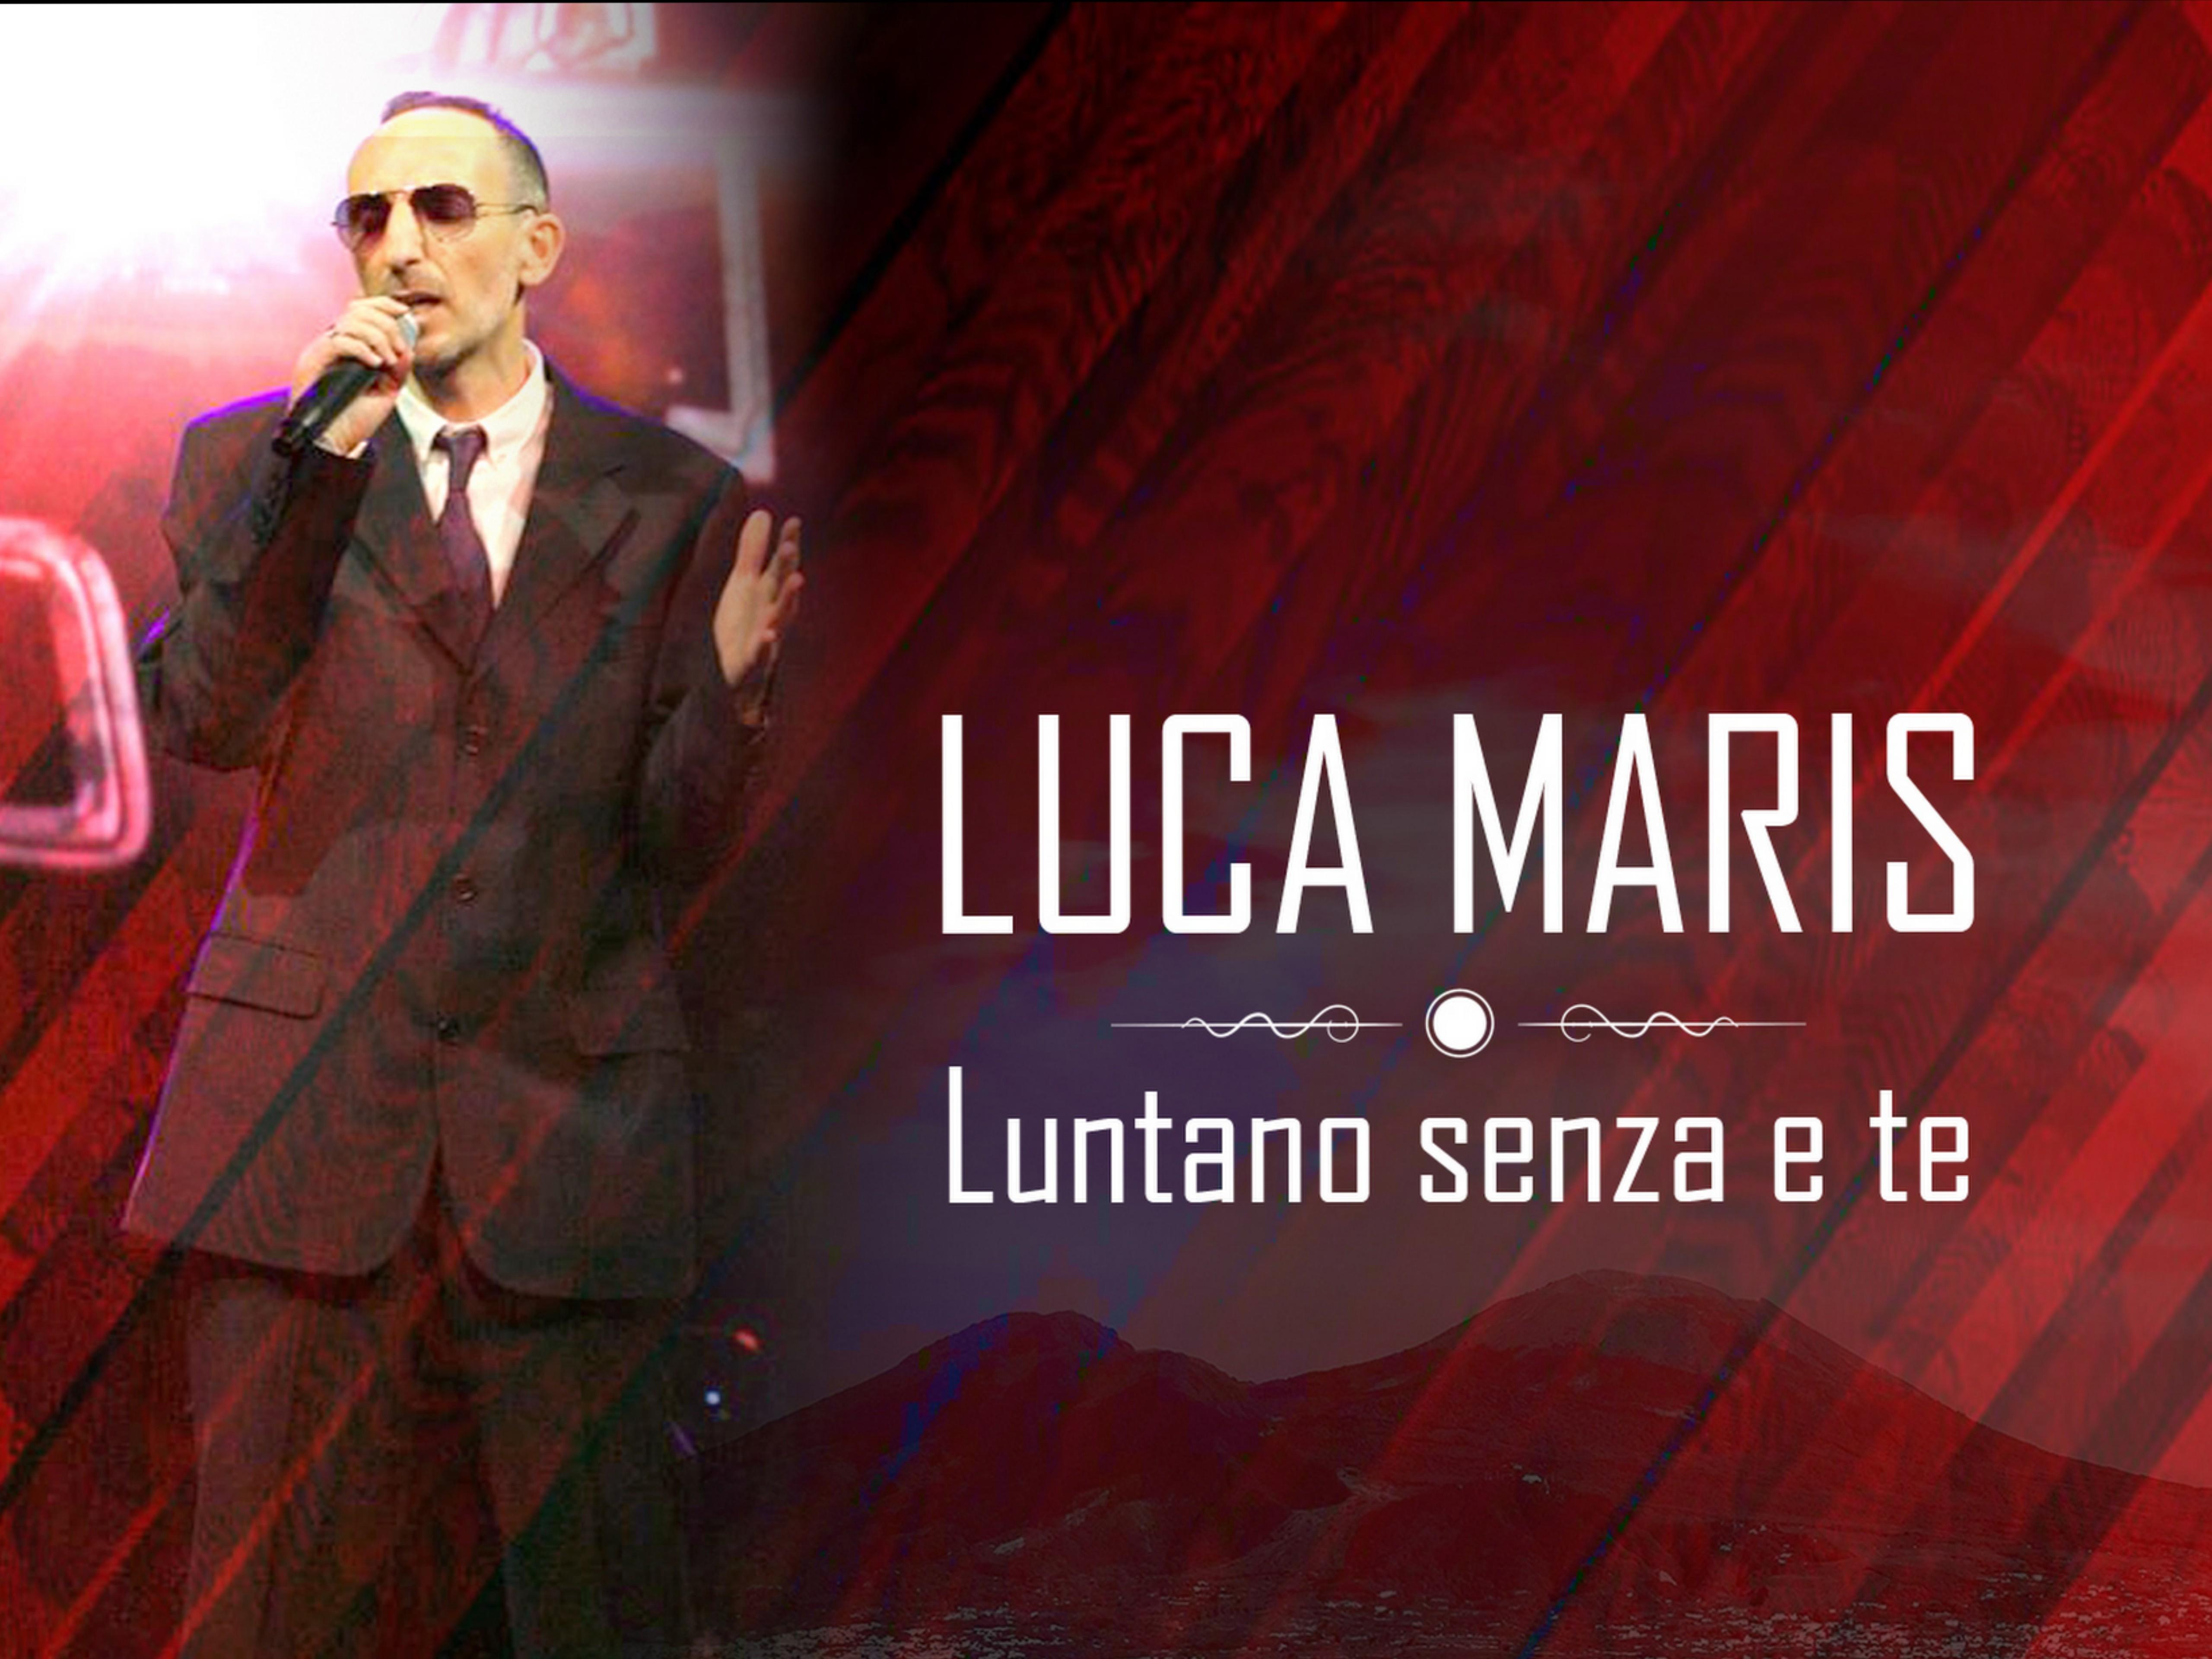 Luca Maris